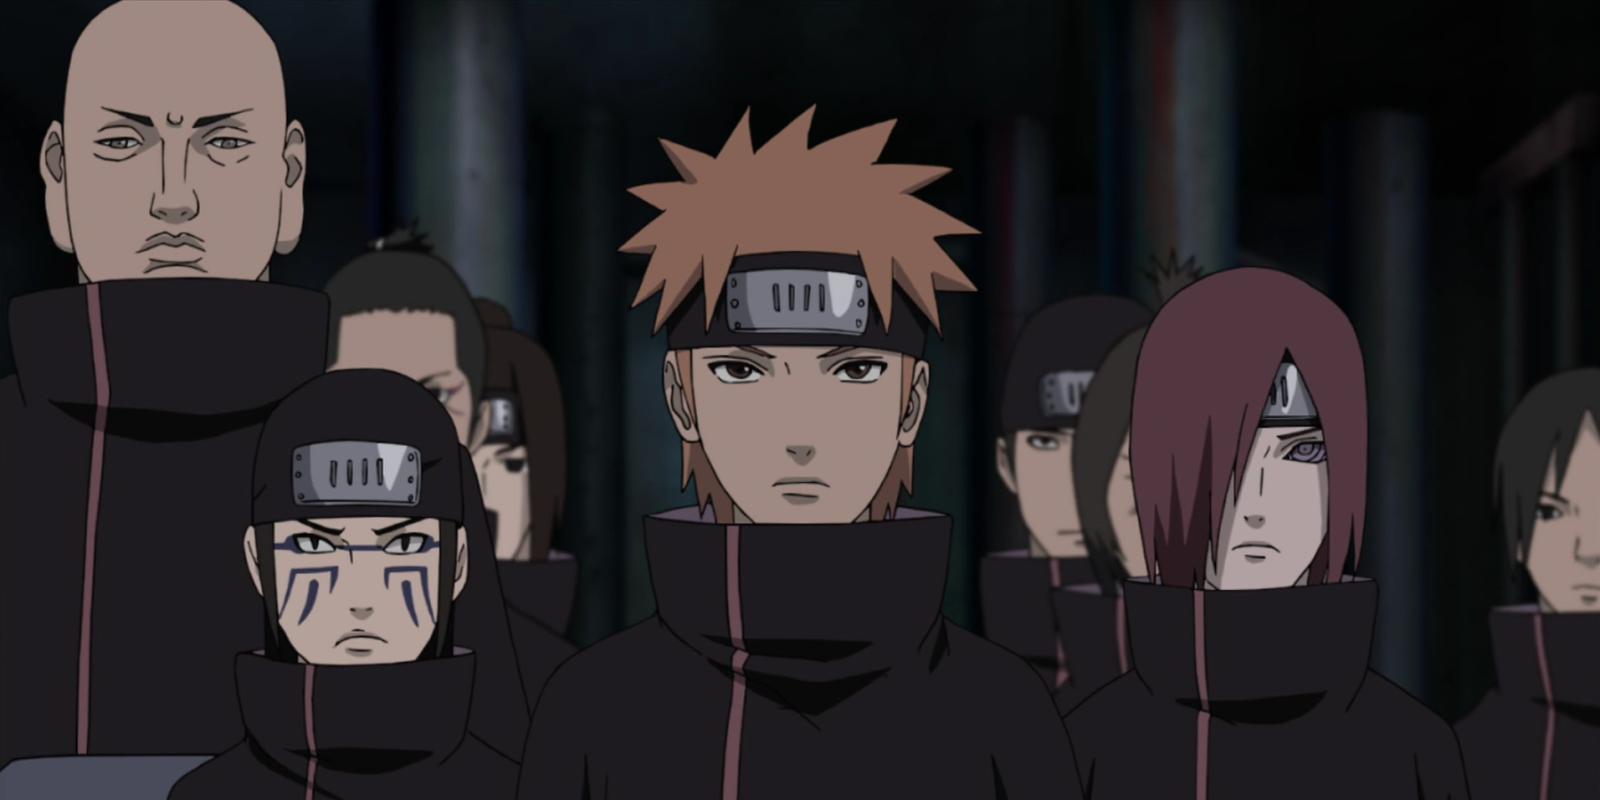 Naruto: Every Member Of The Akatsuki, Ranked Weakest To